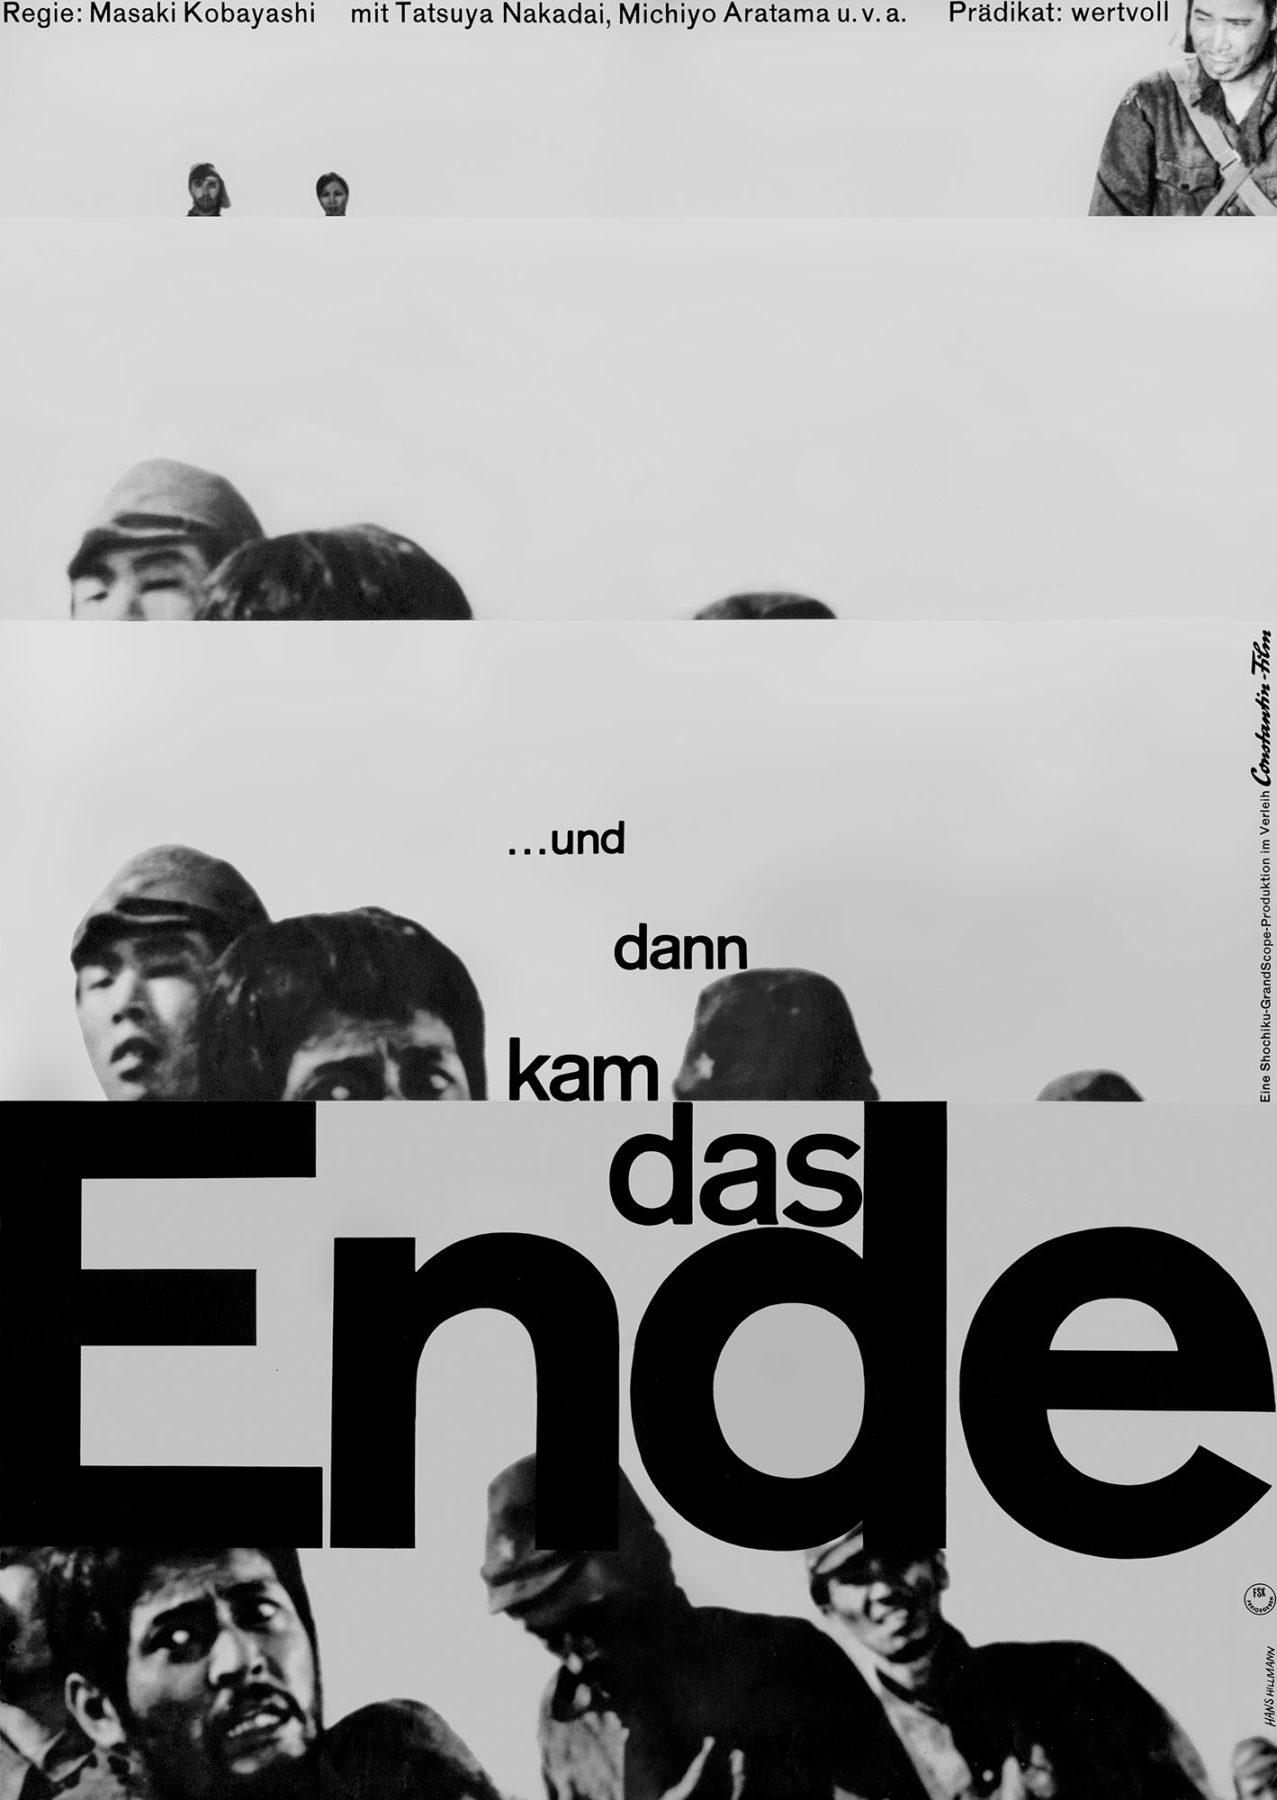 Hillmann 1962 Und dann kam das Ende Constantin Film Plakat A1